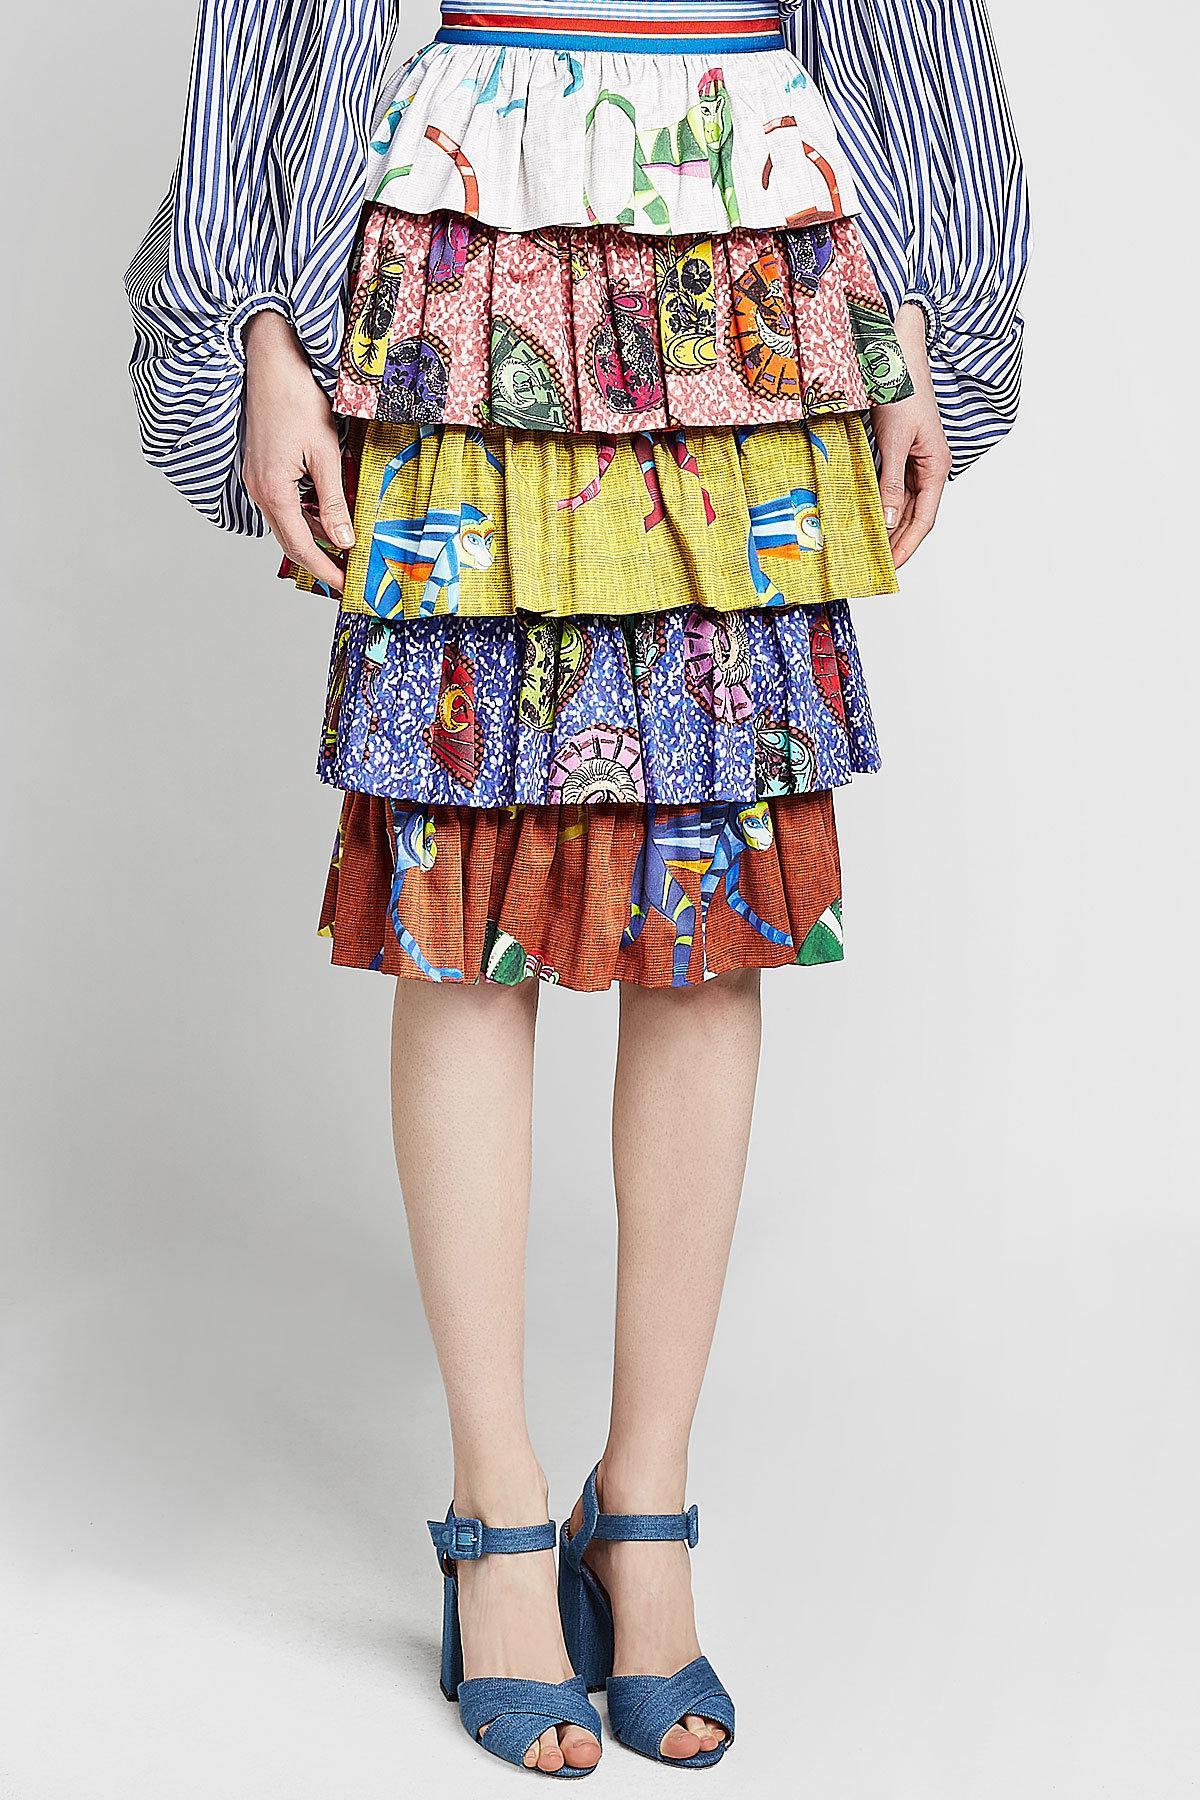 7734ea9788 Stella Jean - Multicolor Tiered Cotton Print Skirt - Lyst. View fullscreen